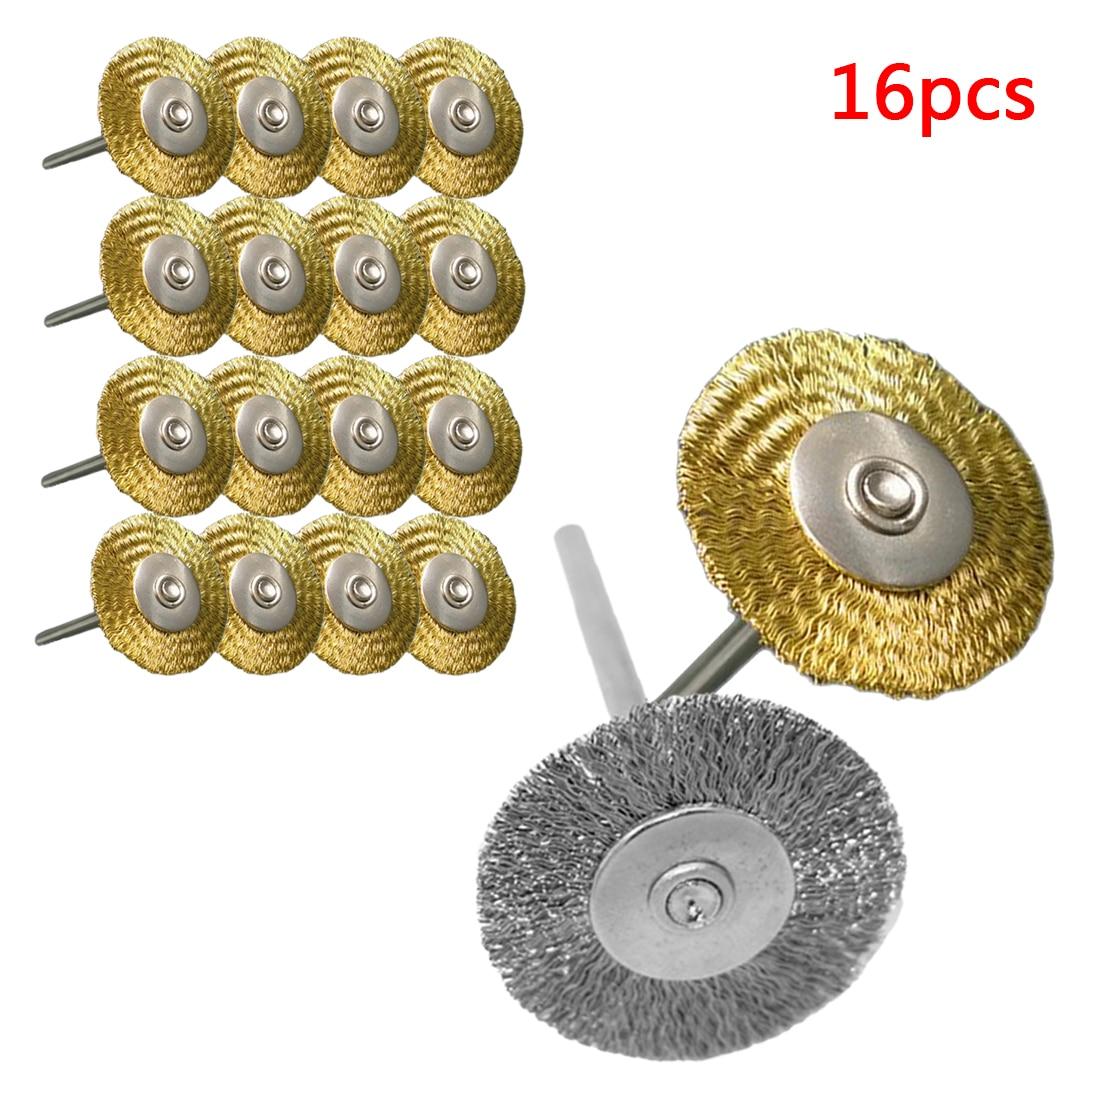 Polishing Dremel Brush 16pcs Stainless Steel Wire Wheel Brushes Set Kit Dremel Accessories For Mini Drill Rotary Tools